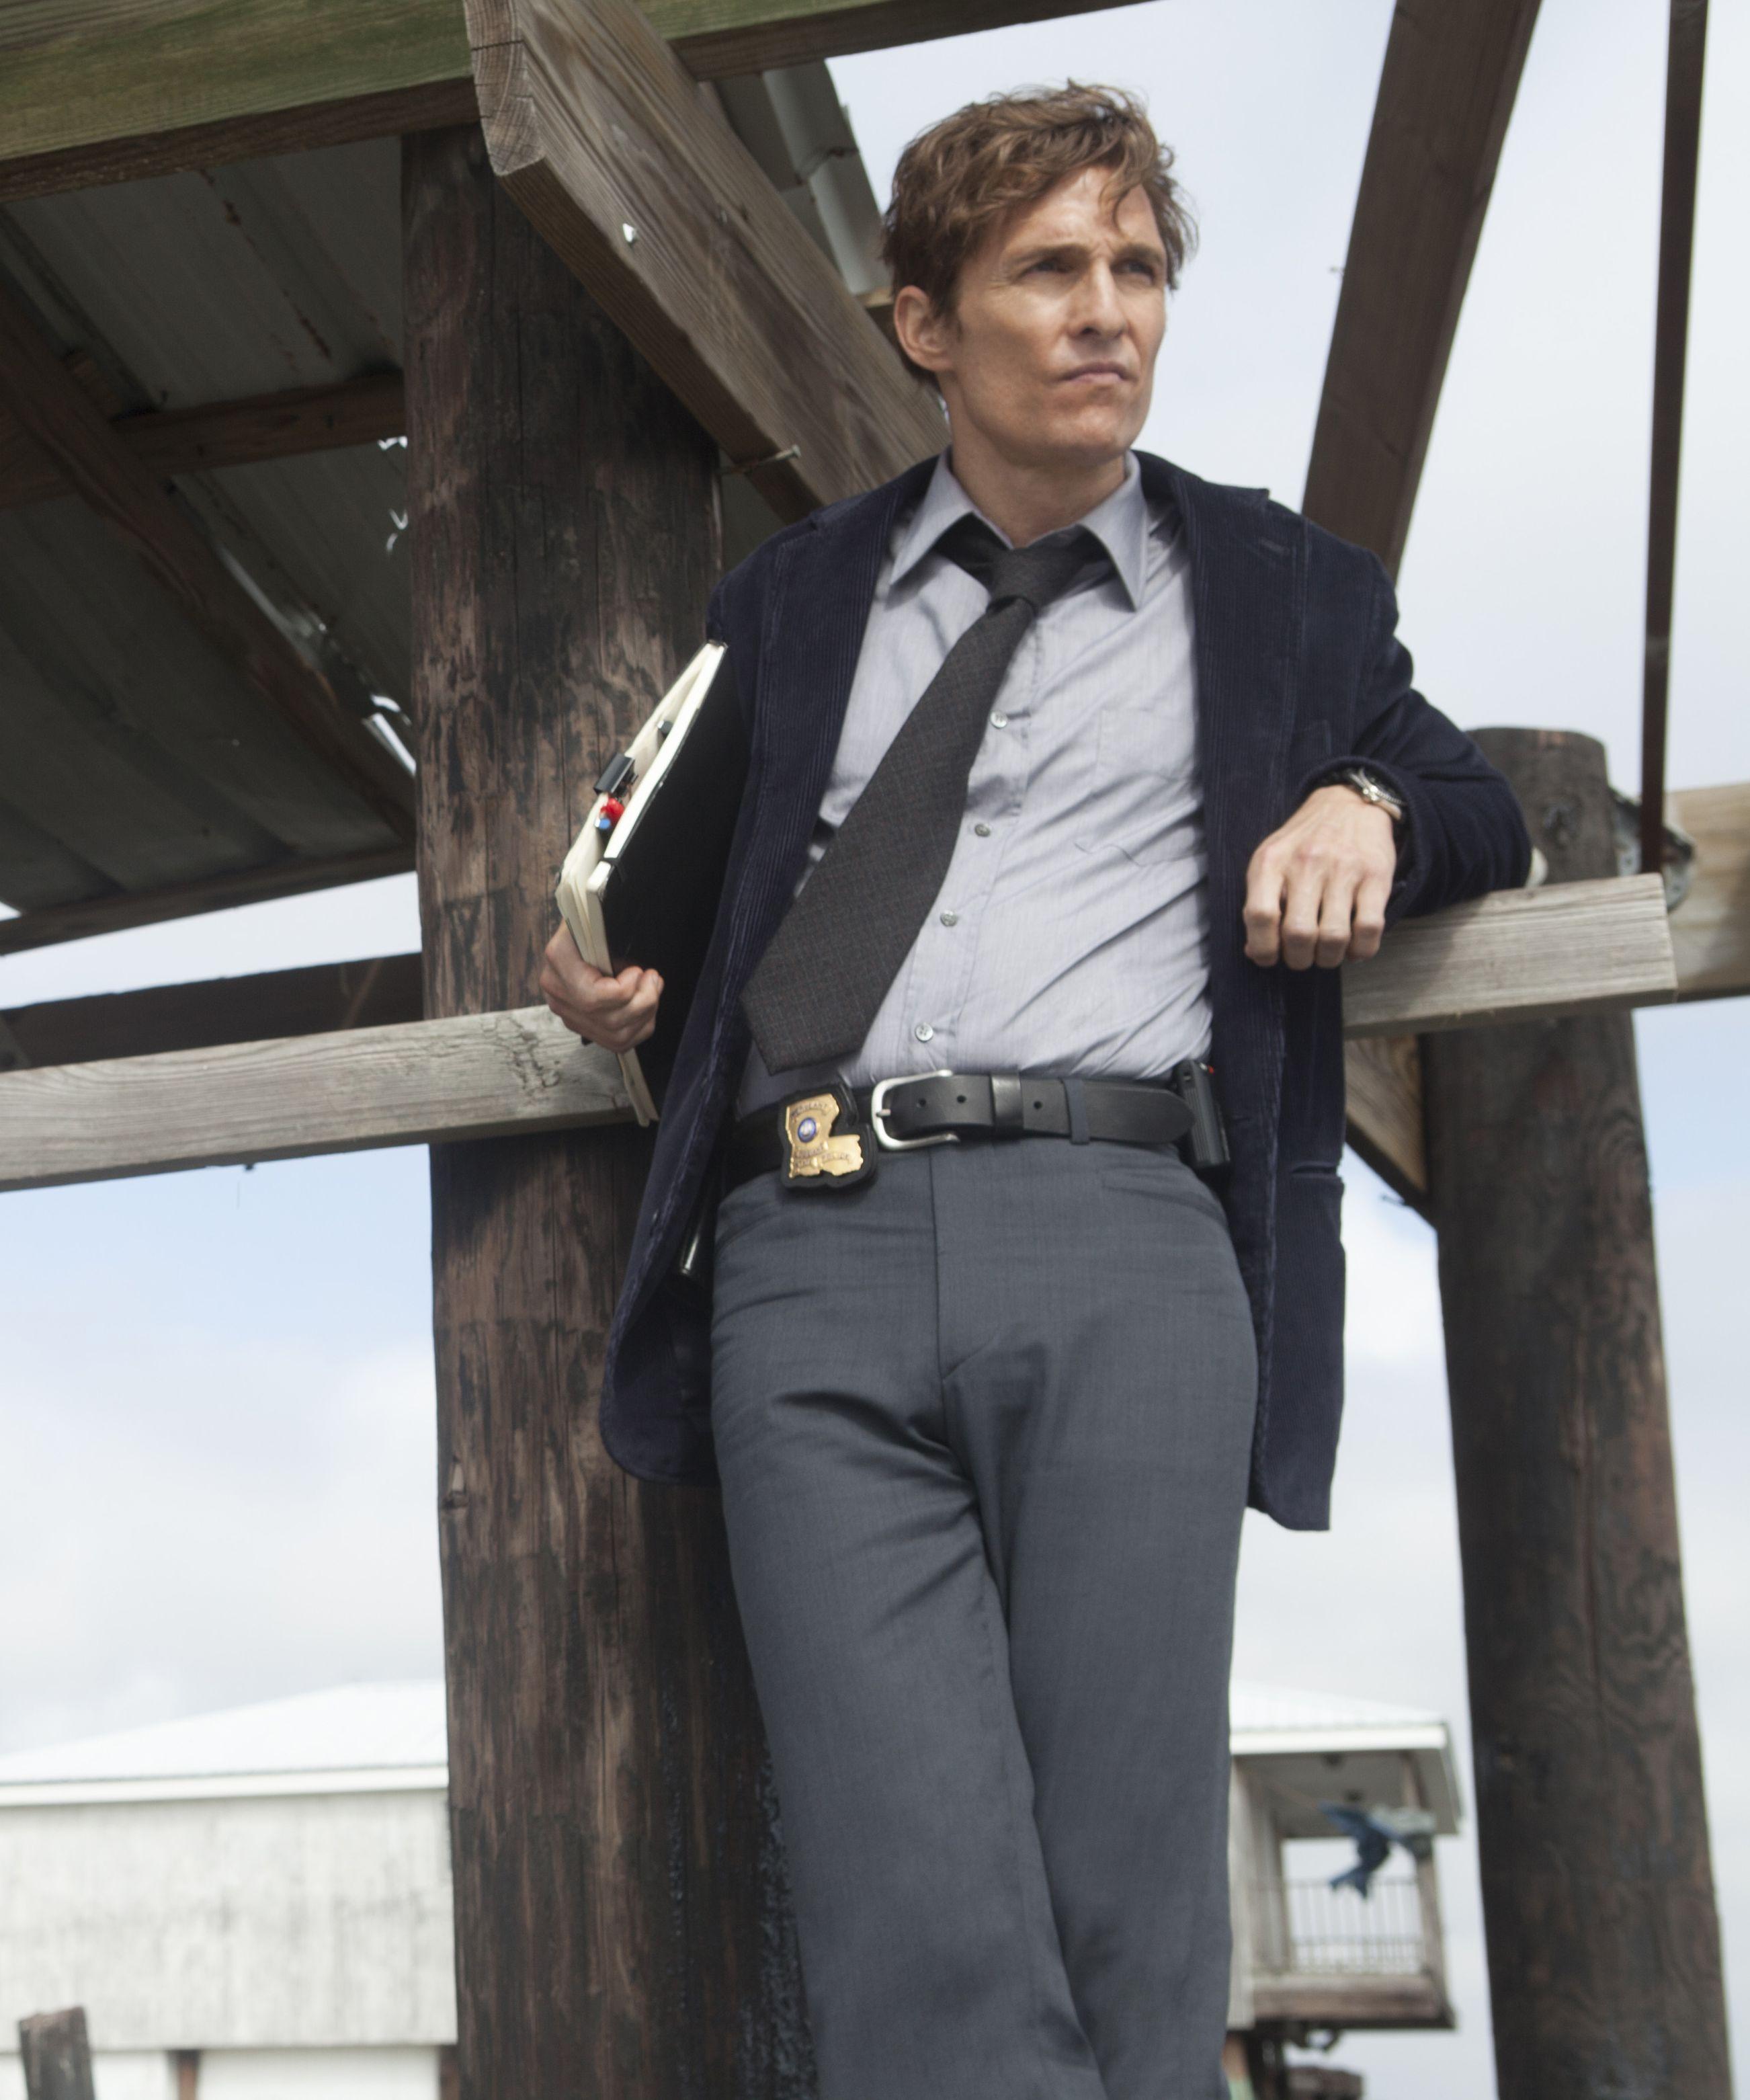 Matthew McConaughey in HBO's True Detective